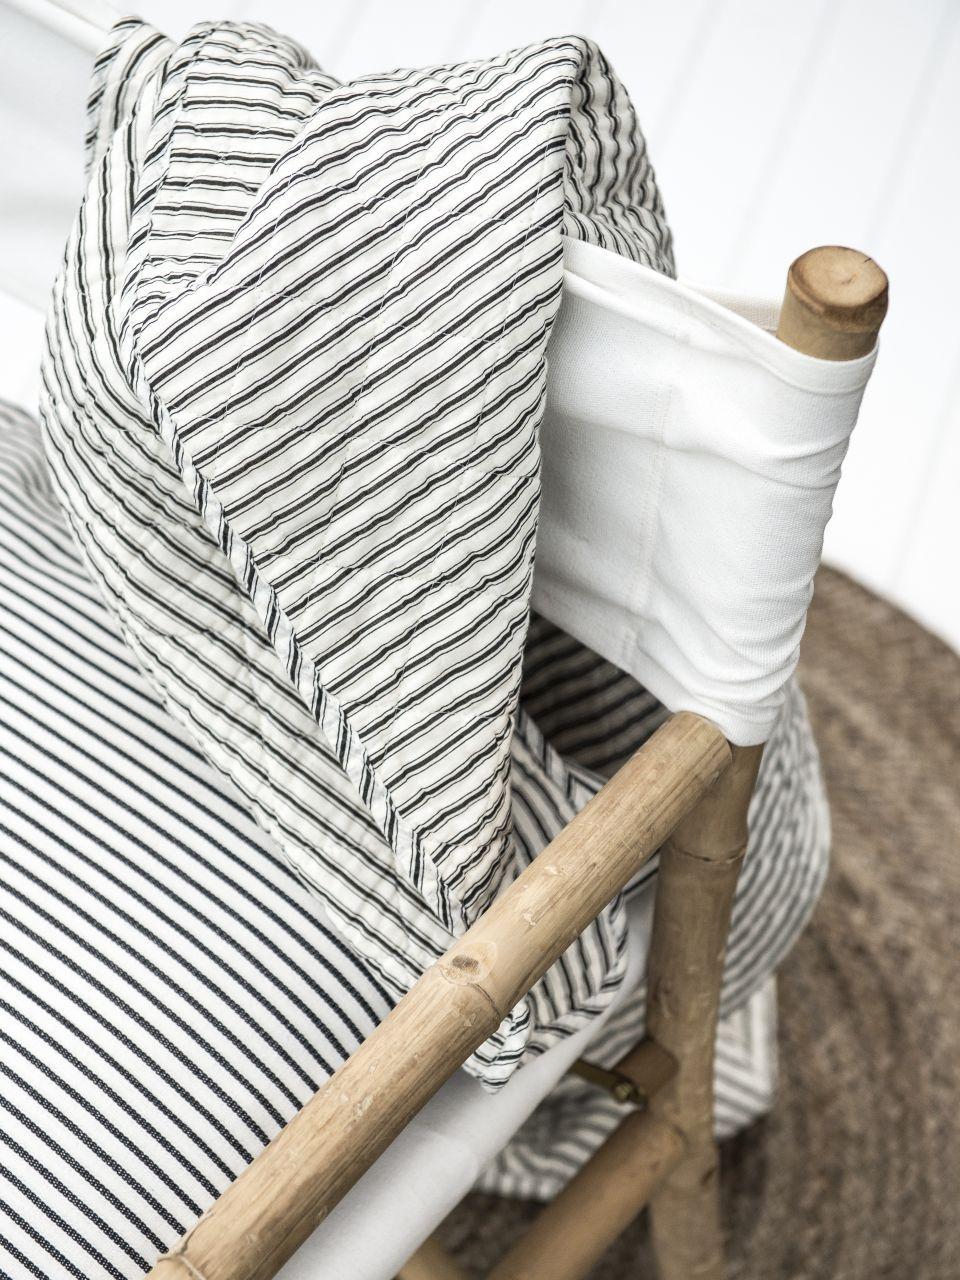 IB LAURSEN Bavlněný přehoz, deka Black Stripe 130x180 cm